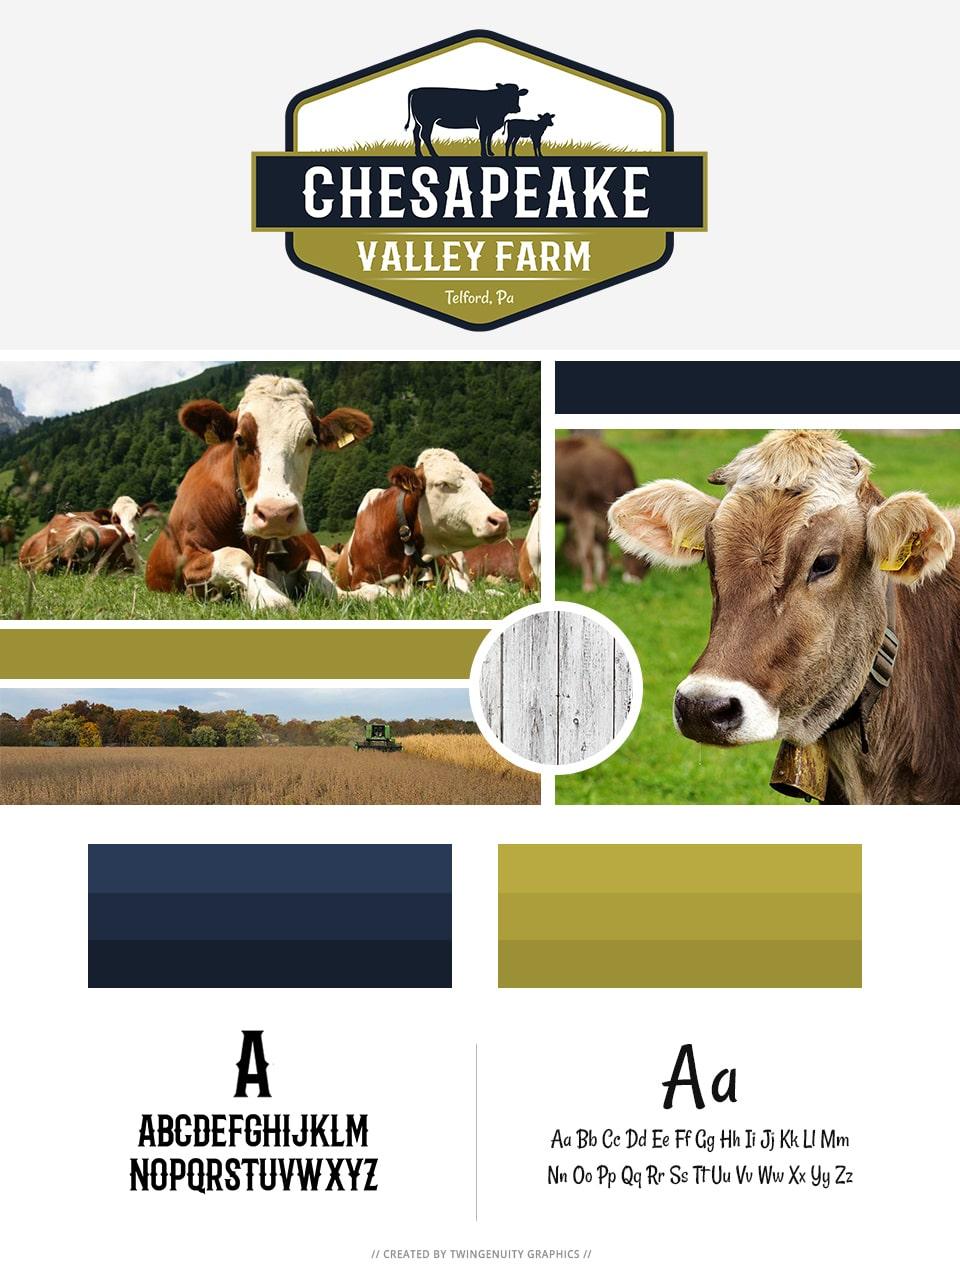 branding board chesapeake valley farm logo